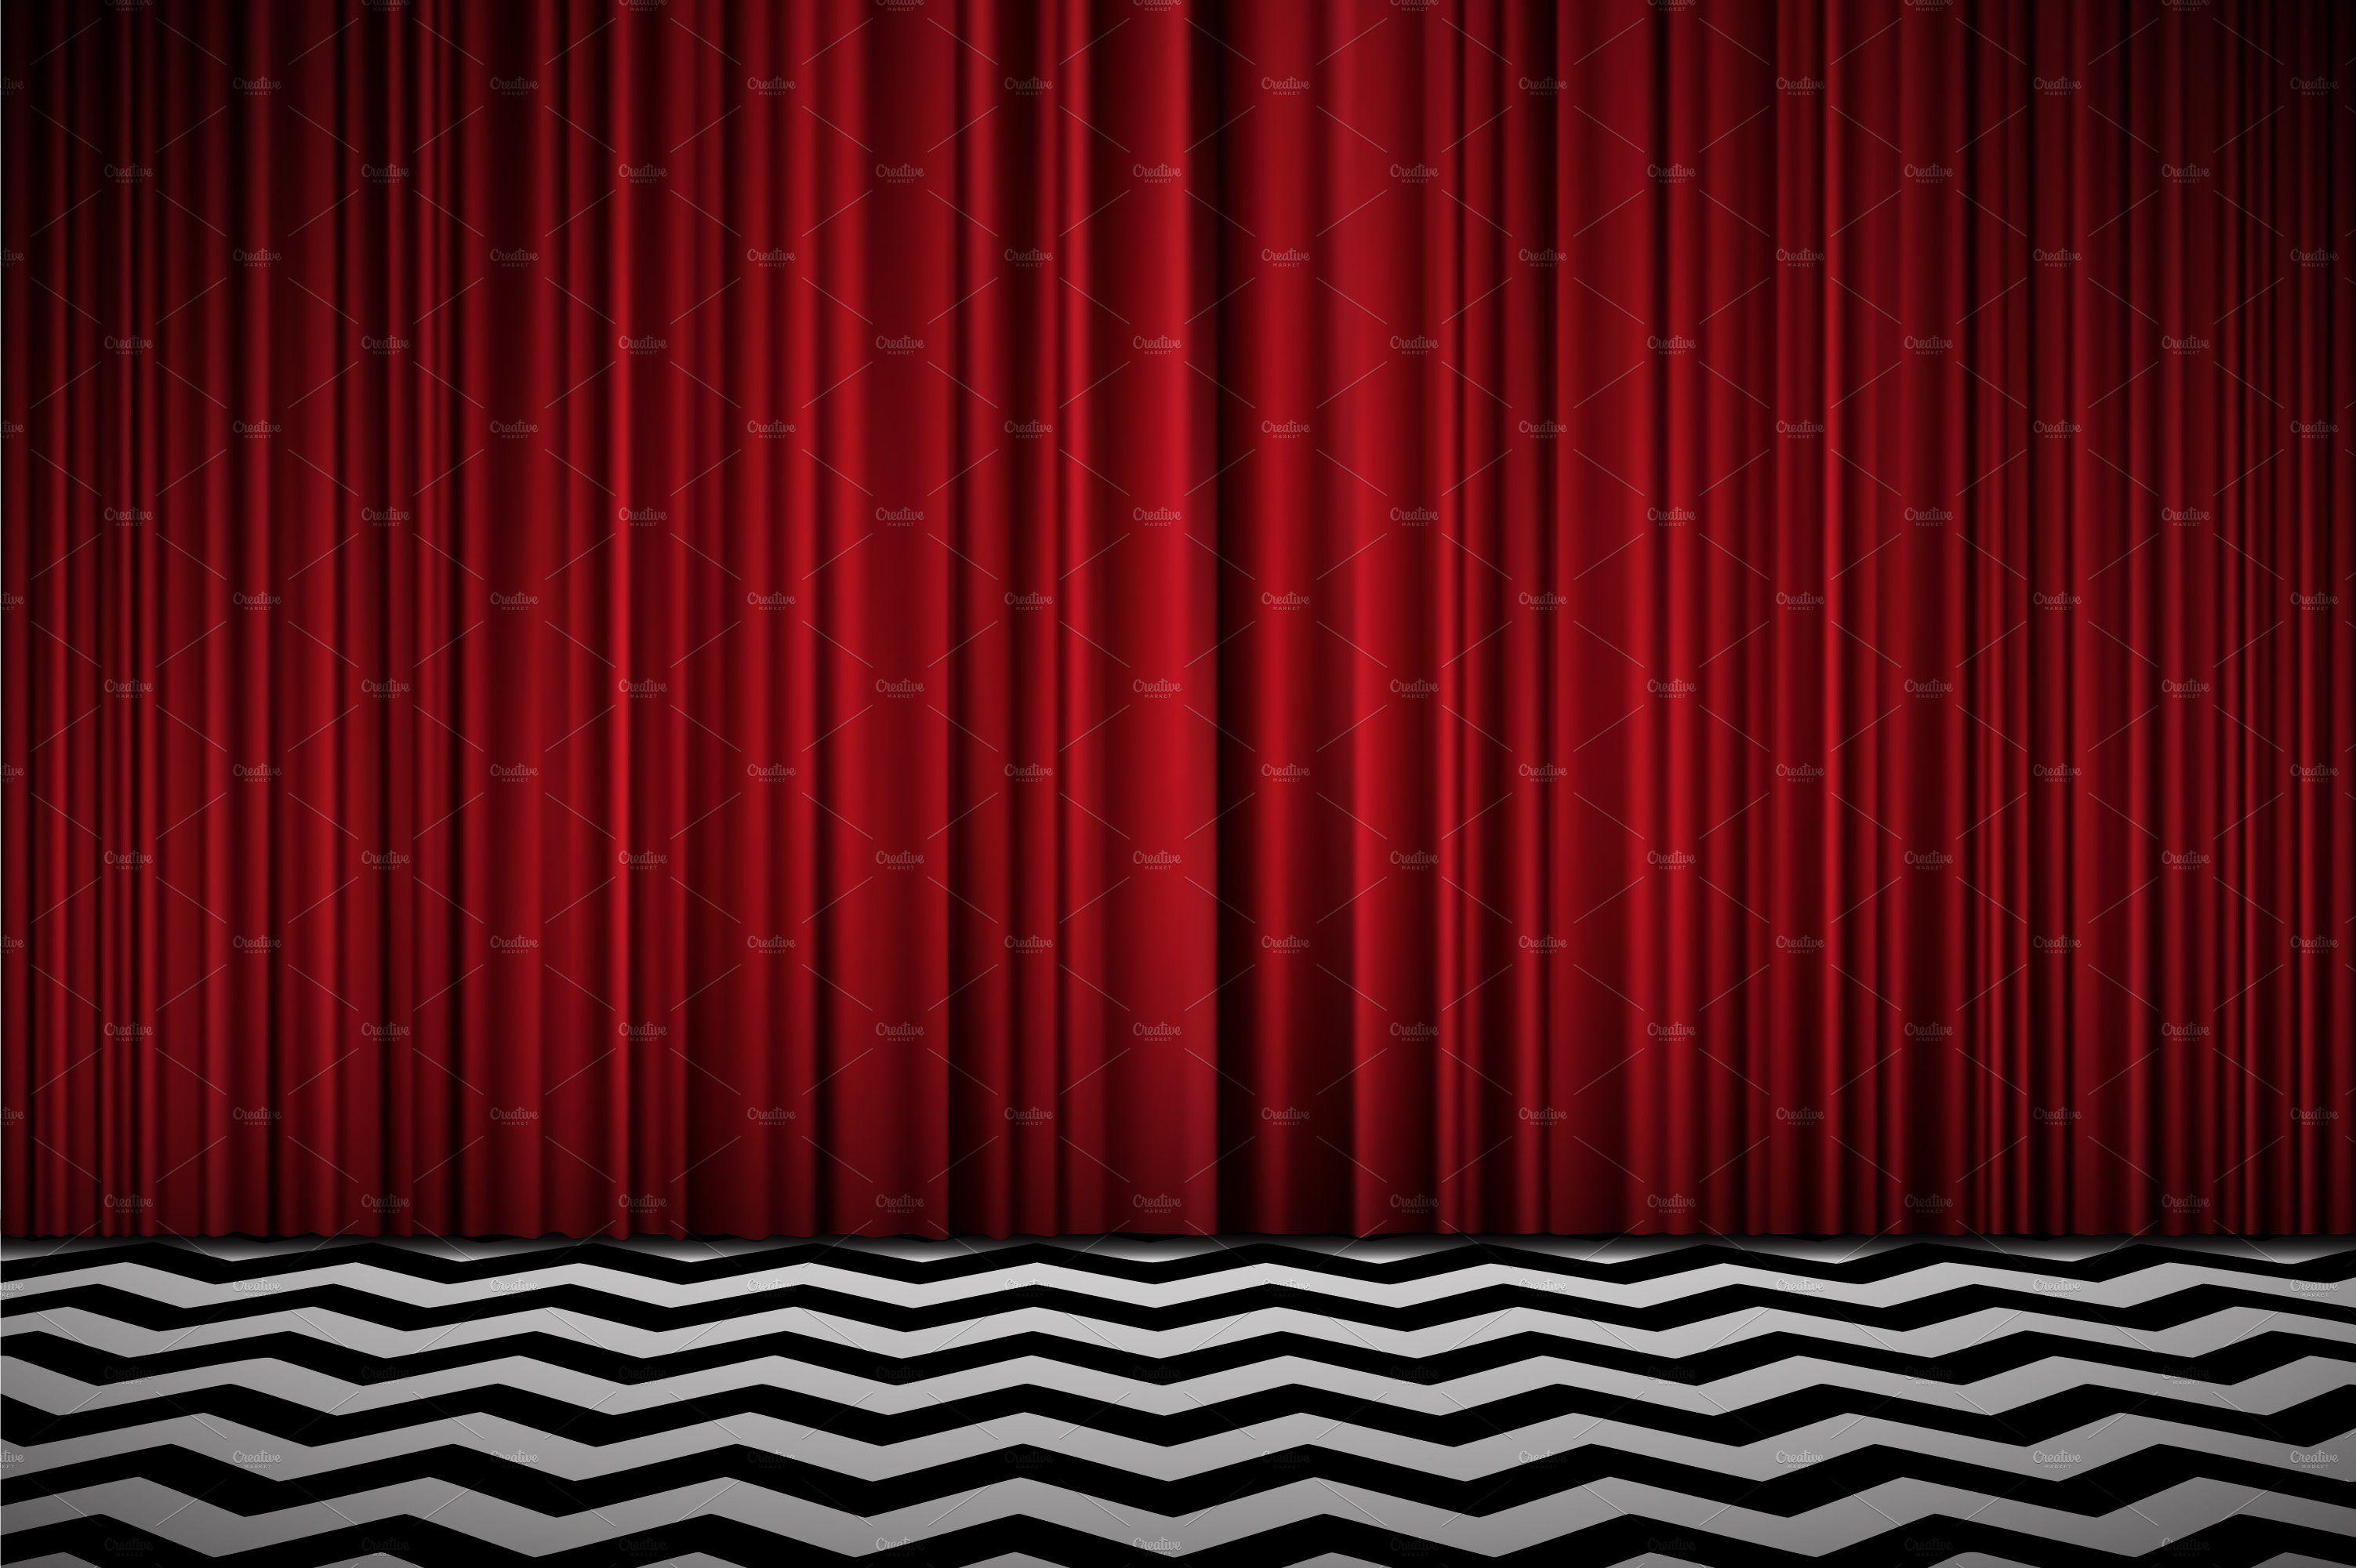 Twin Peaks Background Twin Peaks Red Velvet Curtains Twin Peaks Wallpaper